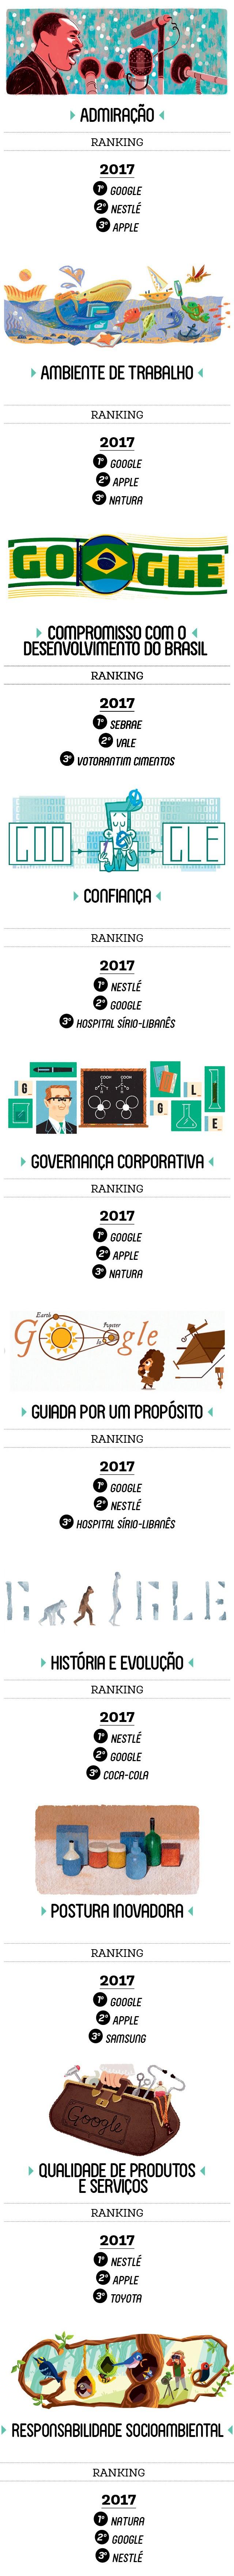 Doodles (Foto: Google)